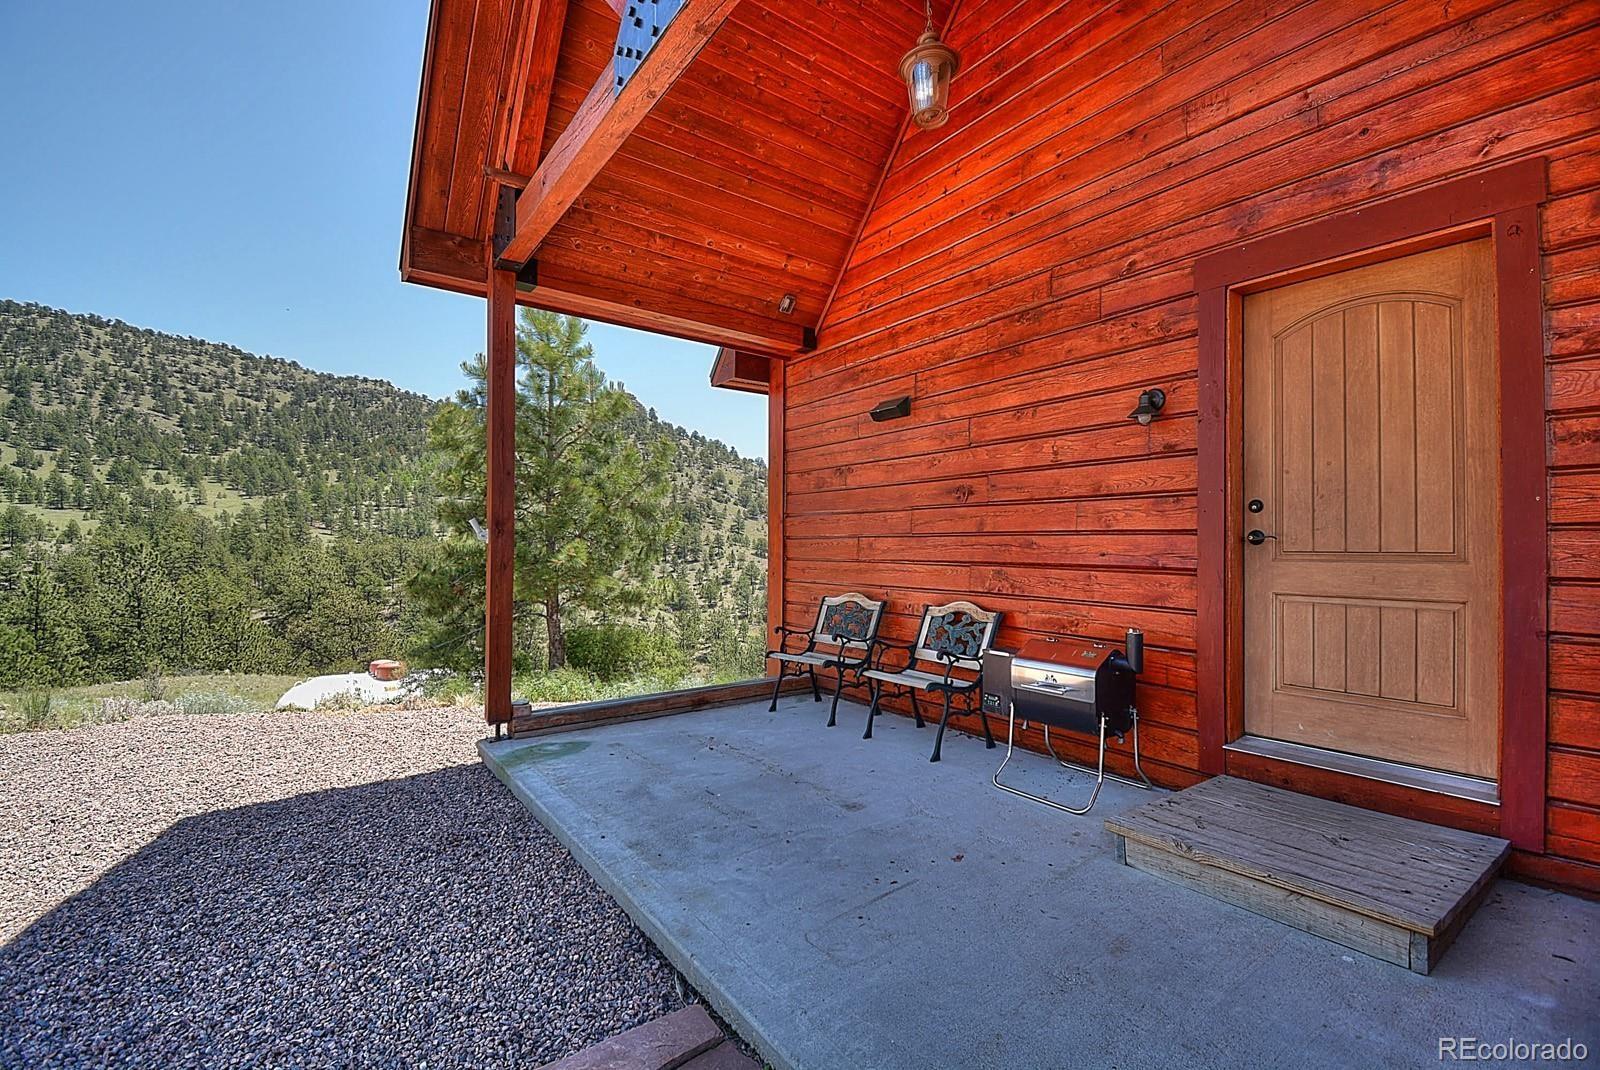 MLS# 8182693 - 8 - 396 Eagle Nest Trail, Guffey, CO 80820